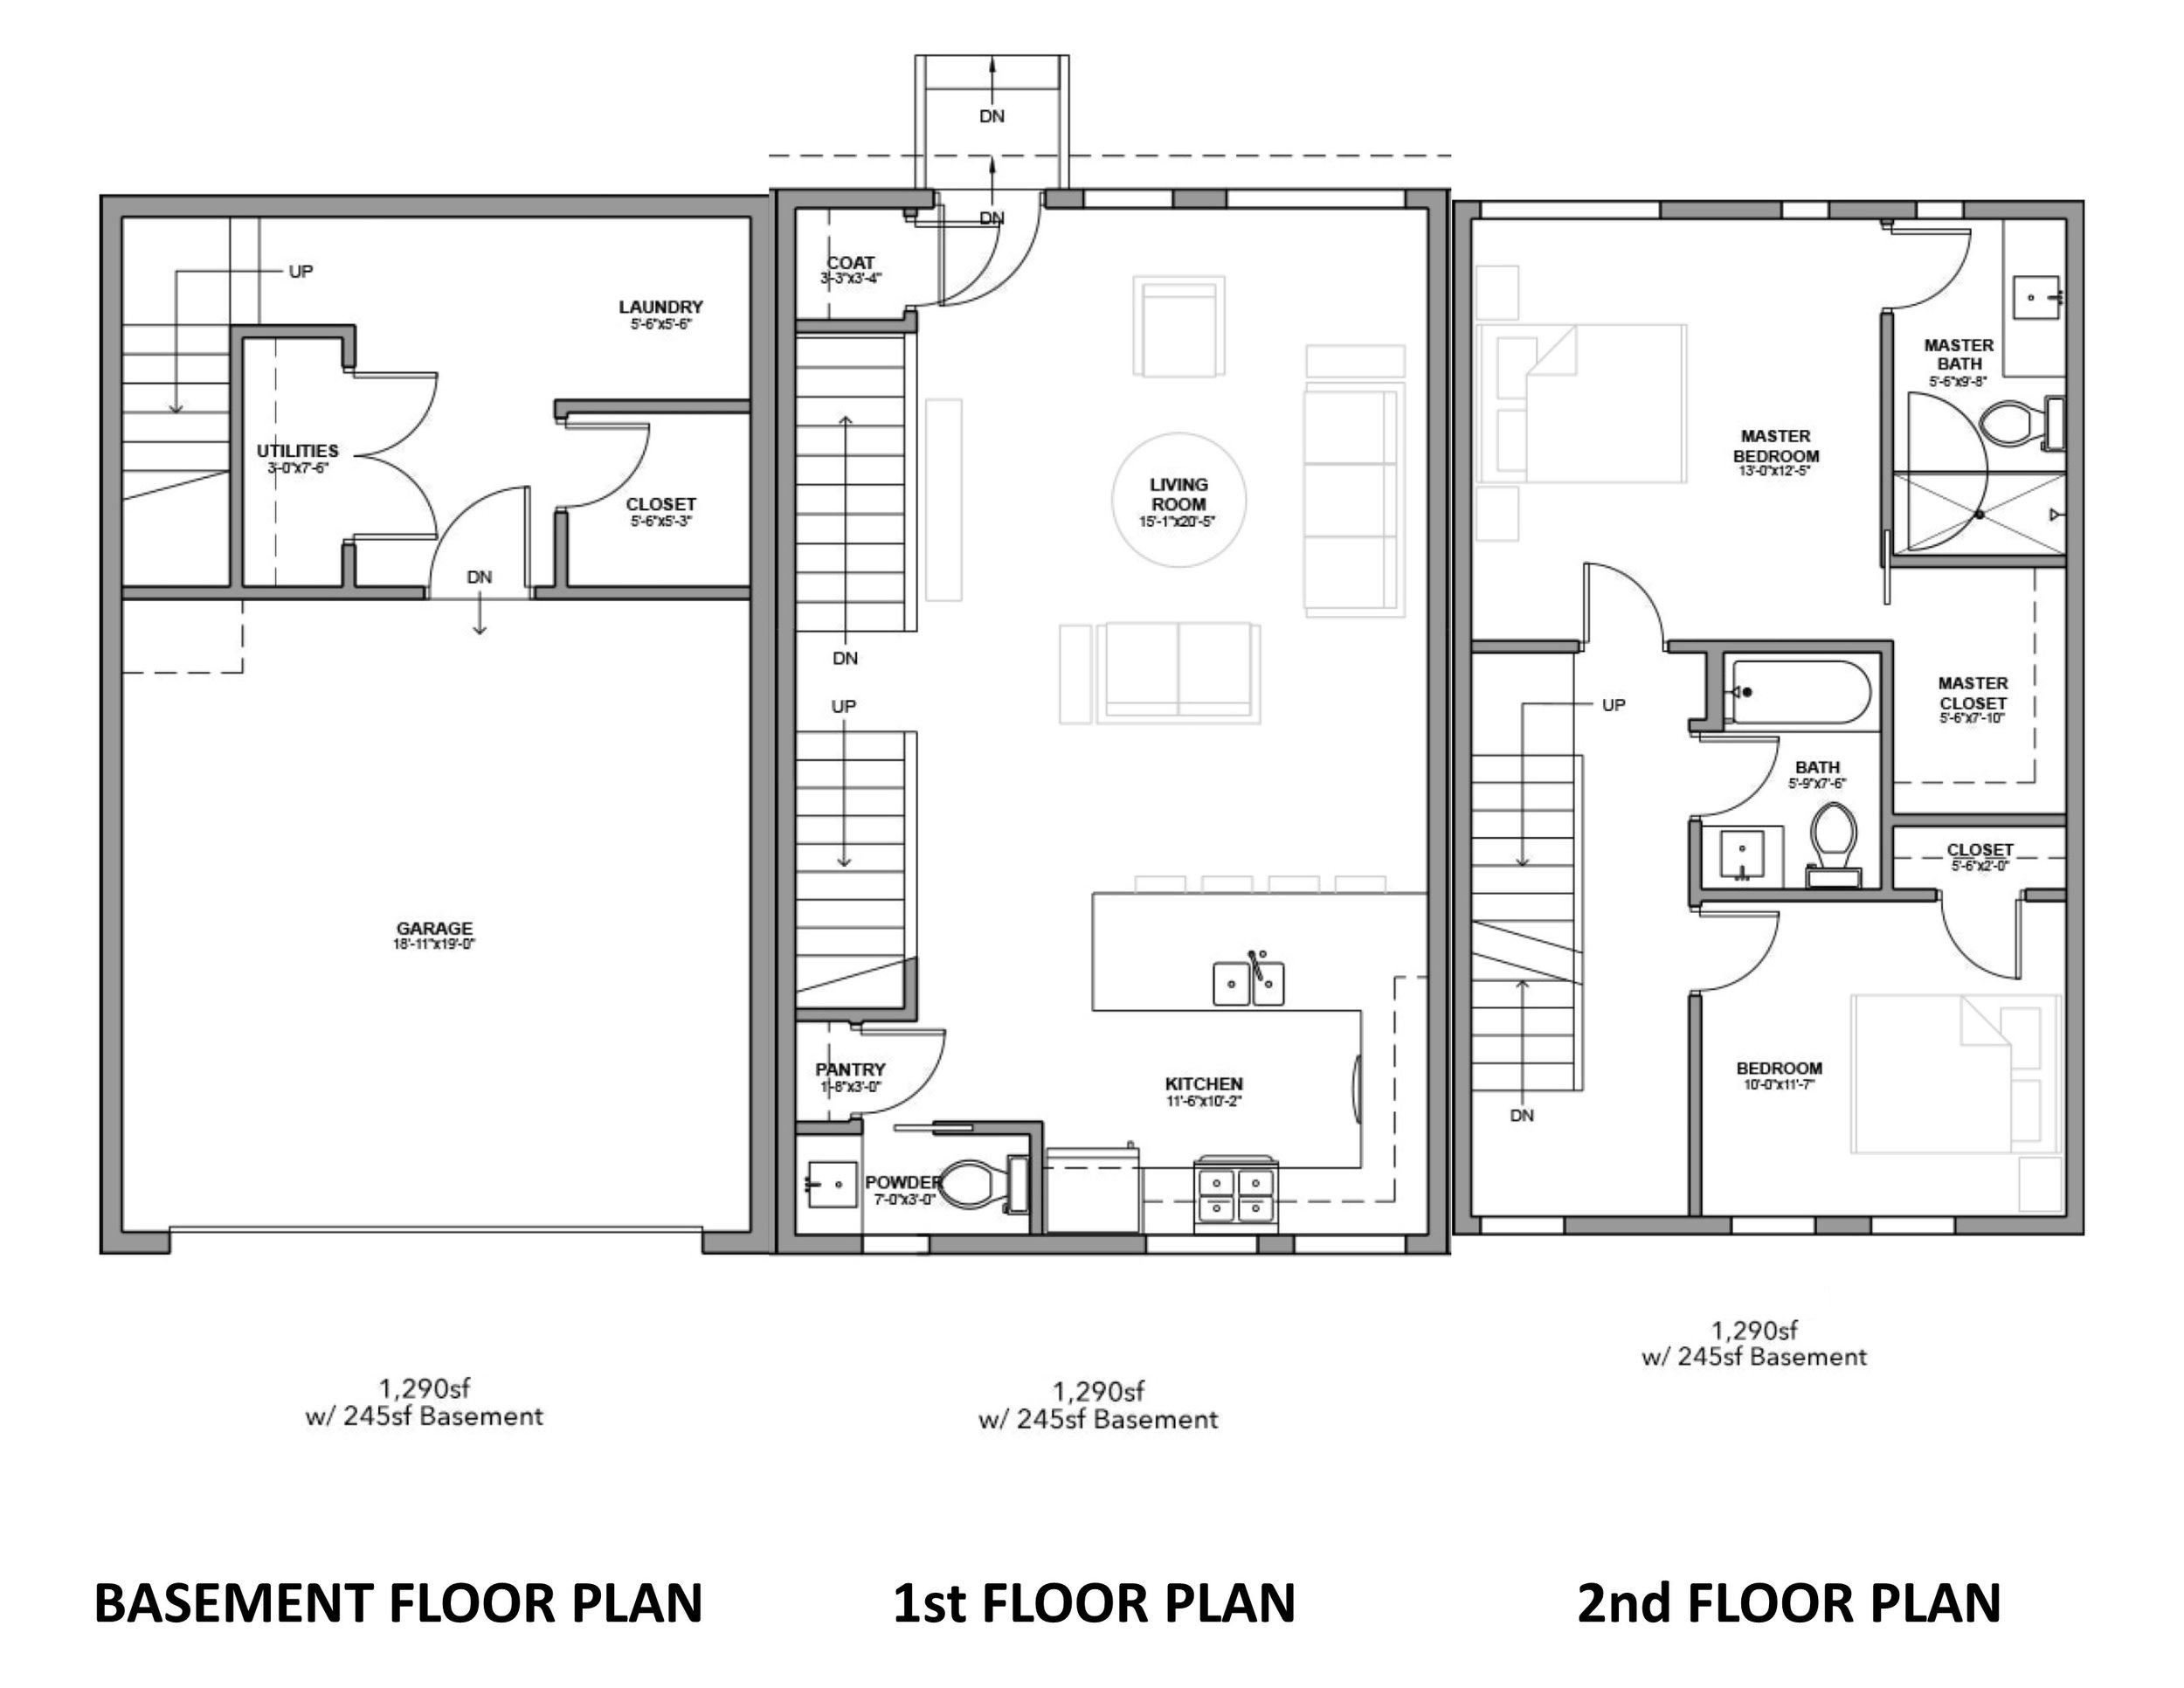 Floorplan Building 4 Unit G, H, I 420, 418, 416 Jefferson.jpg